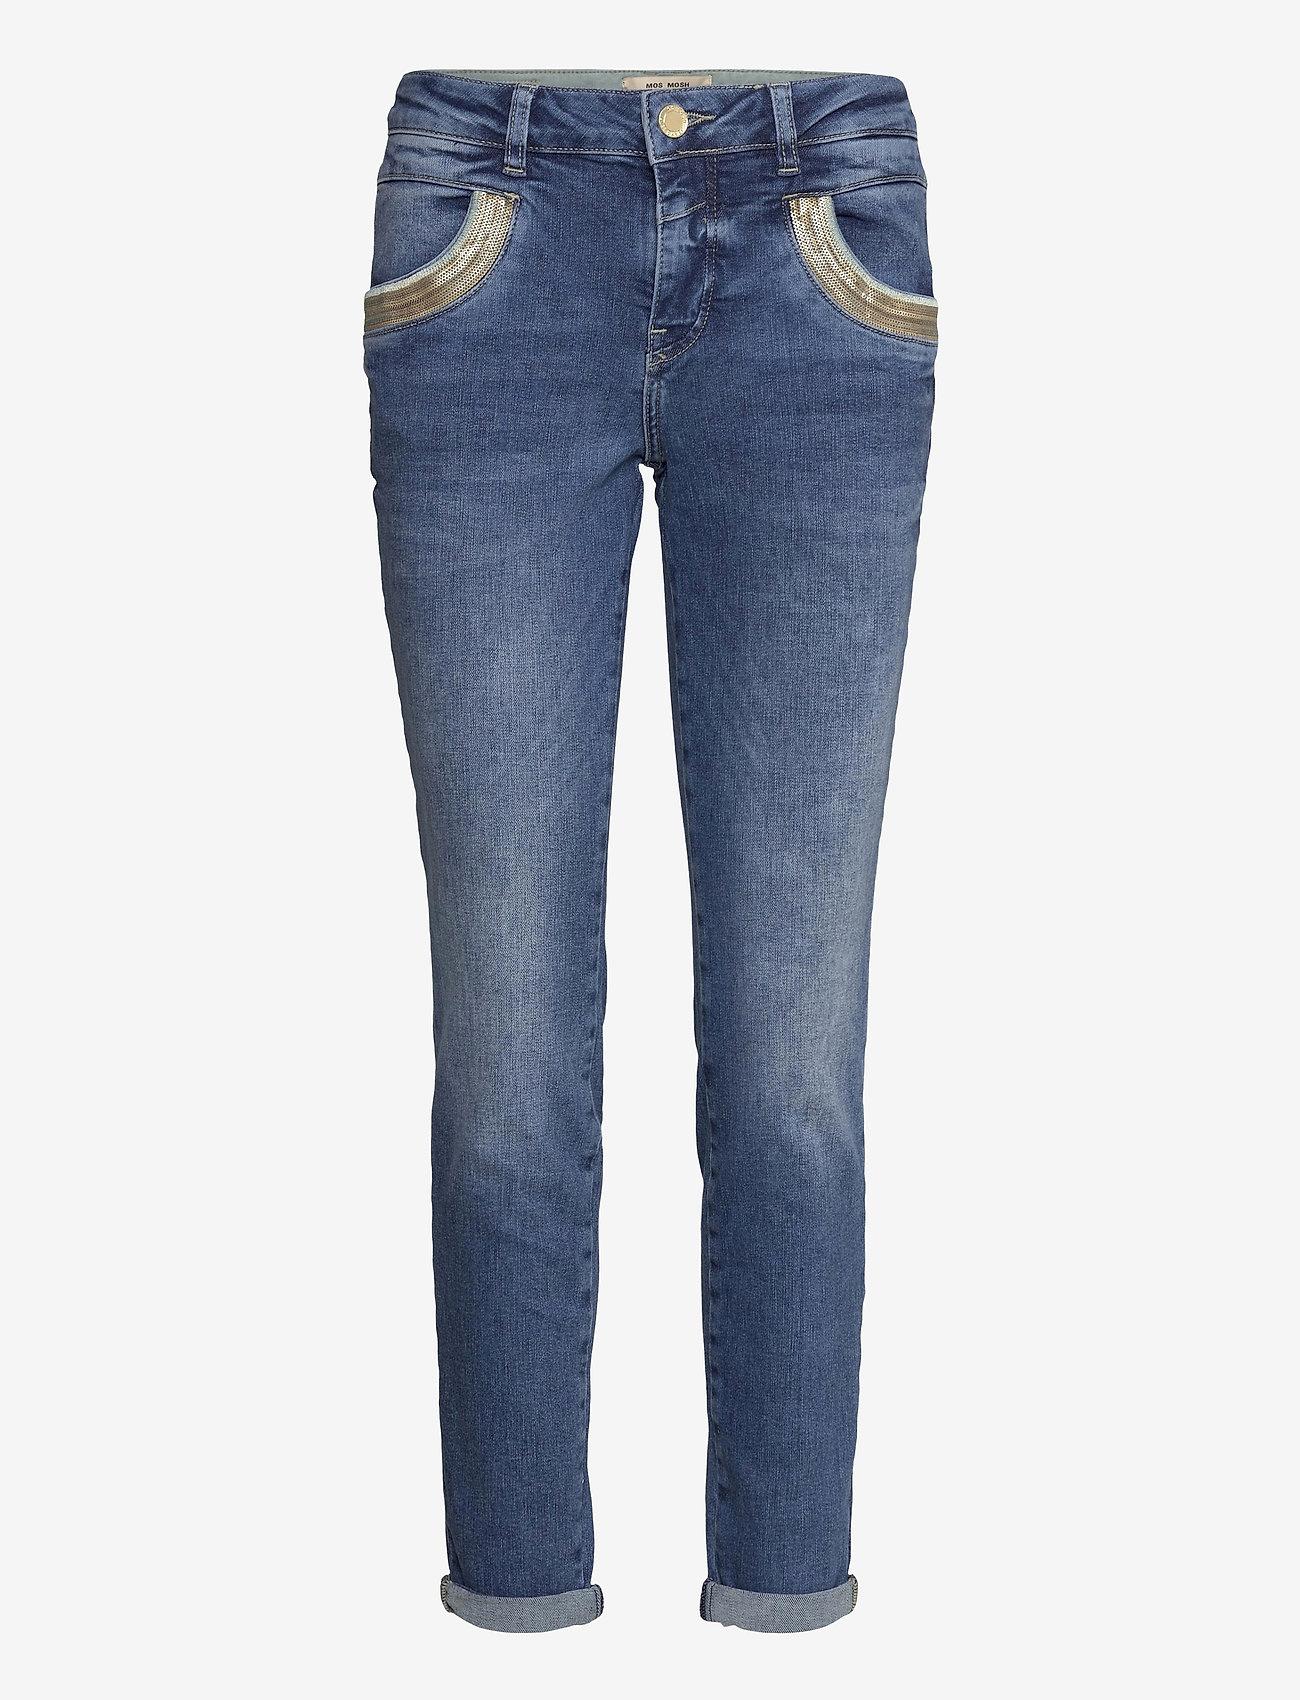 MOS MOSH - Naomi Wave Jeans - slim jeans - blue - 0